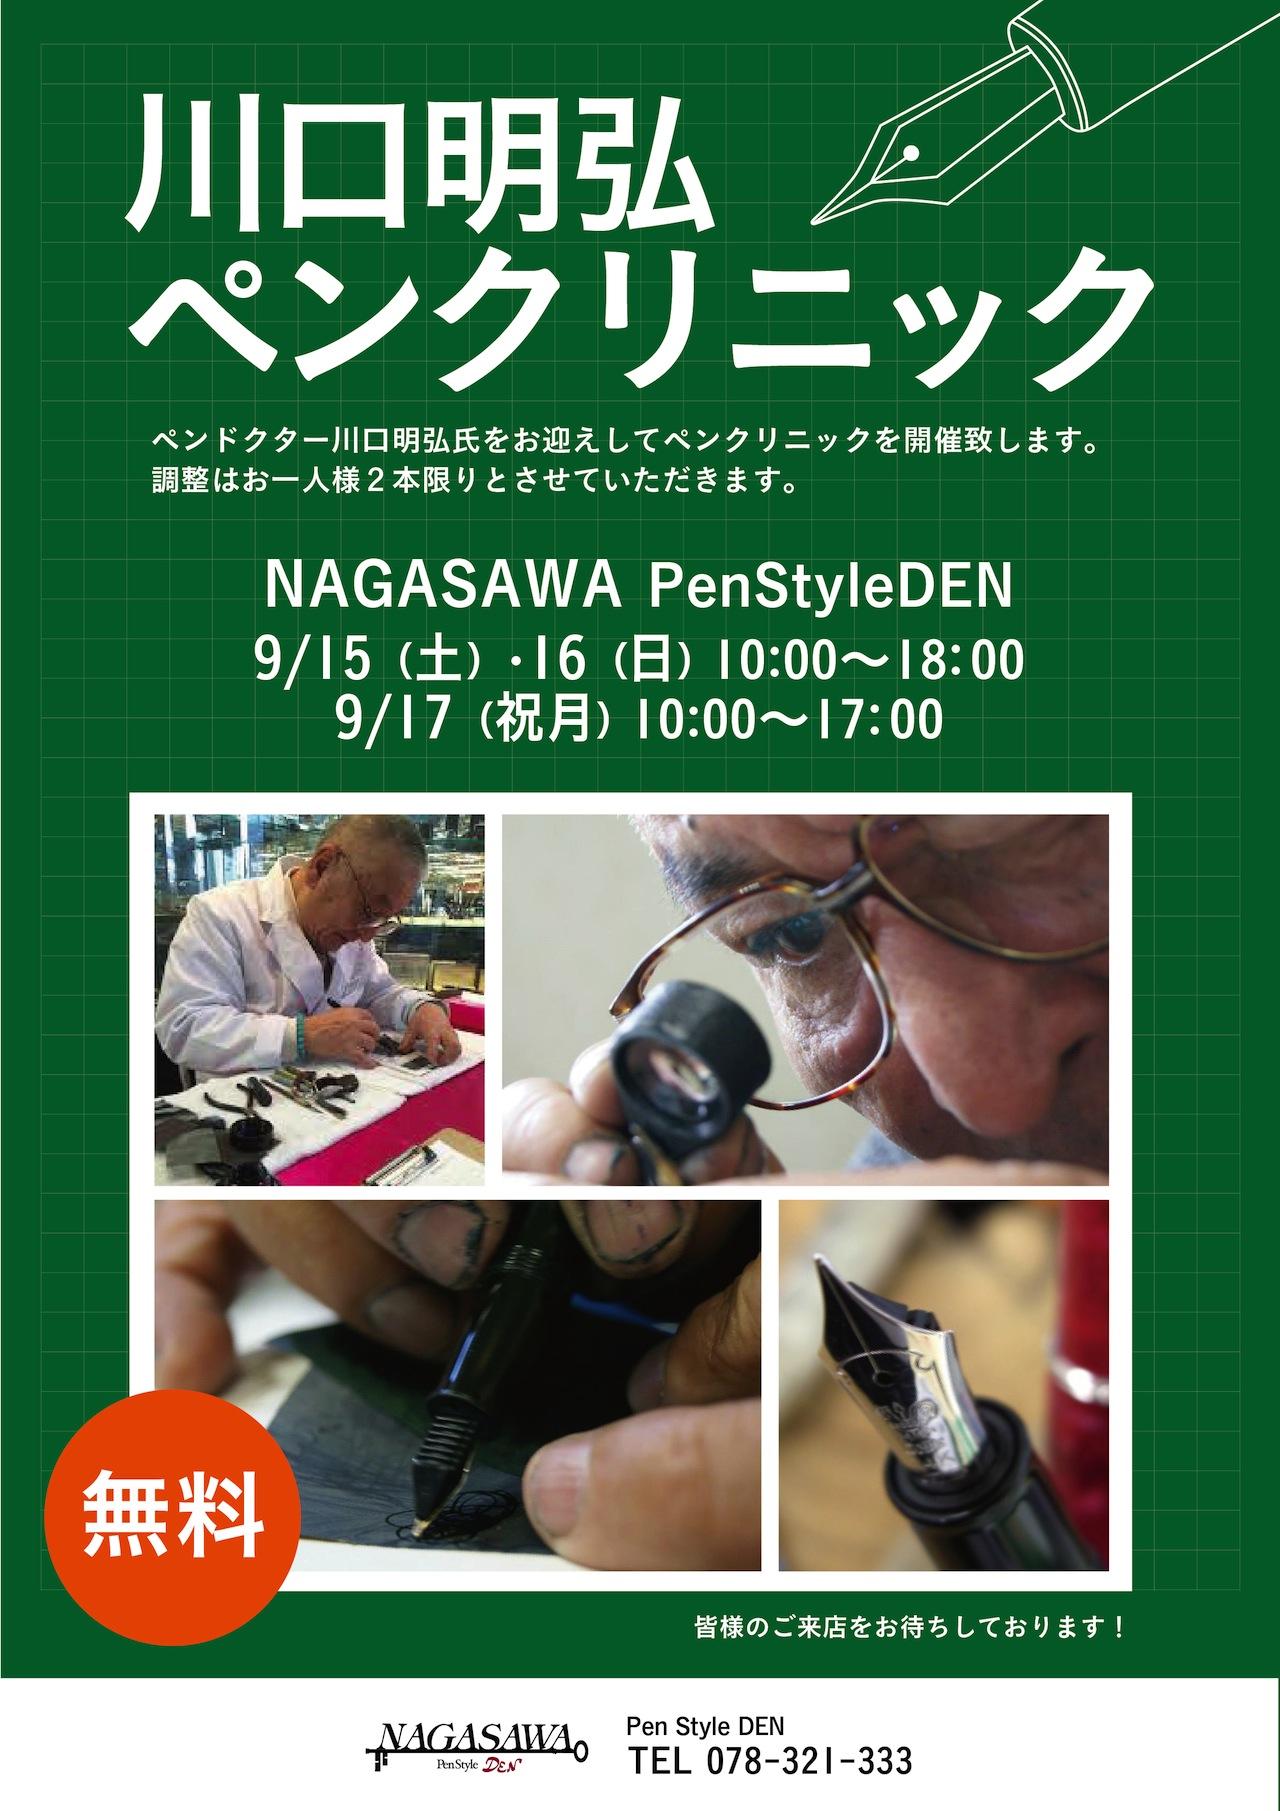 【PenStyle DEN】ペンドクター 川口明弘氏によるペンクリニックを開催します!